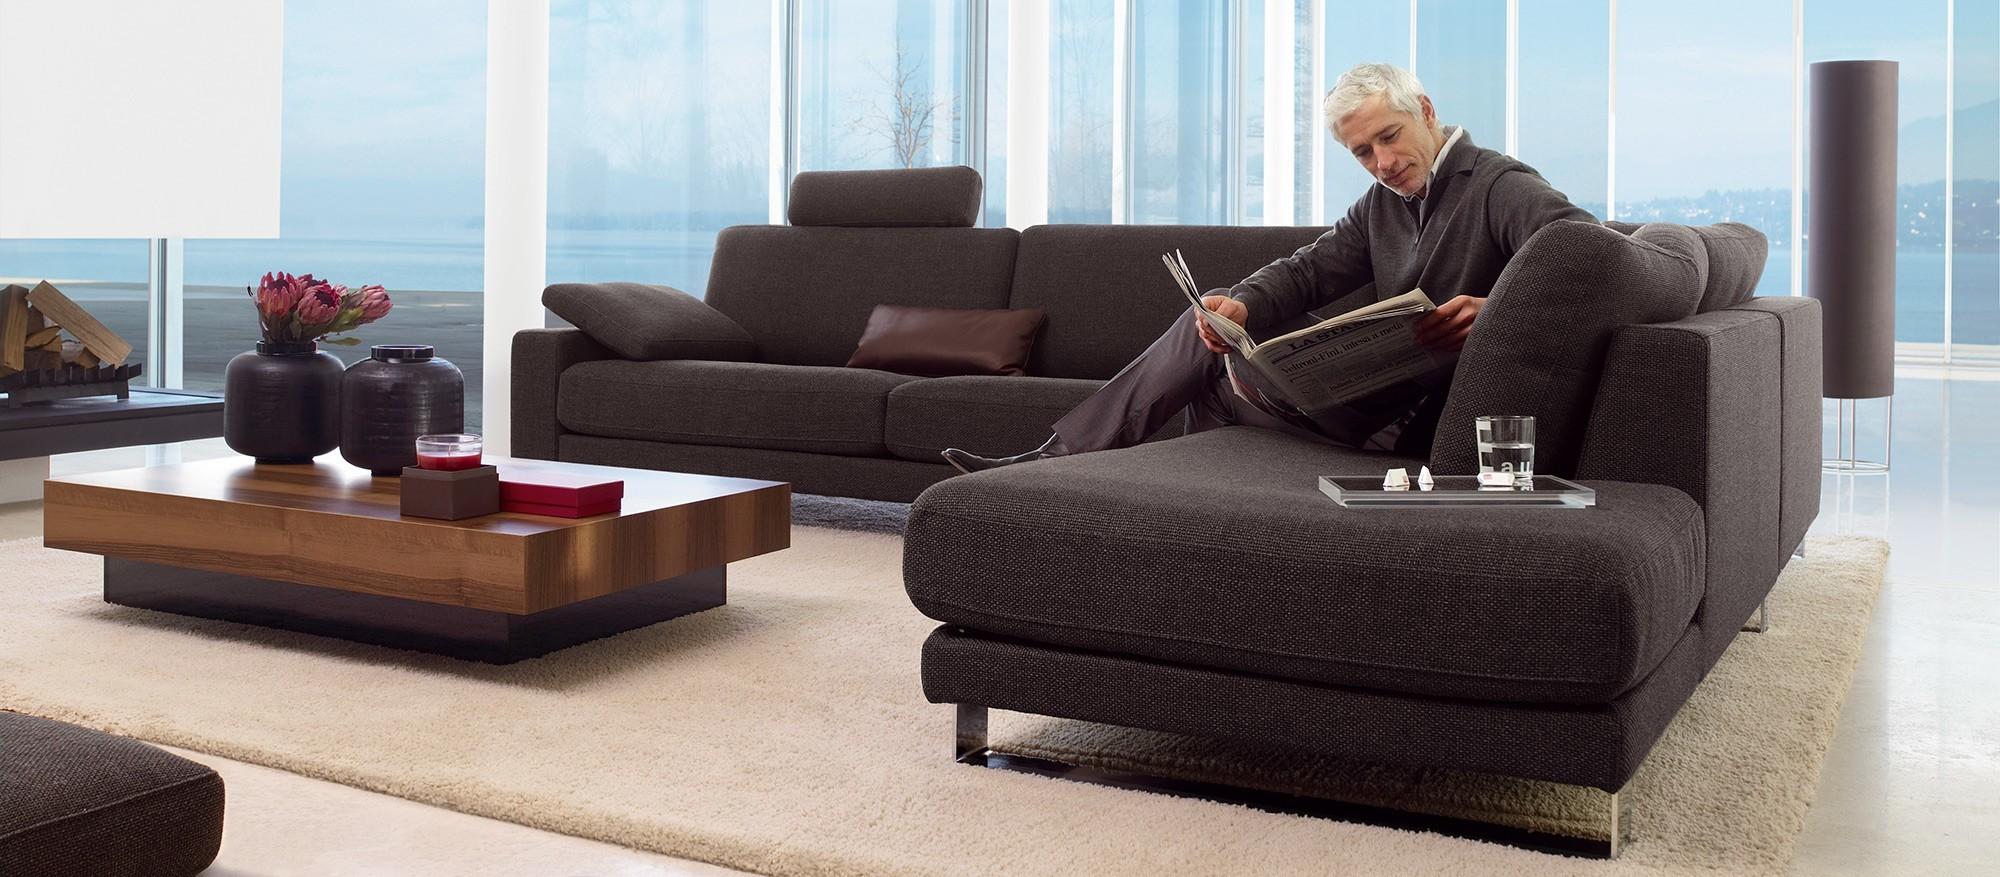 Rolf benz design meubelen interieur plus for Rolf benz ego